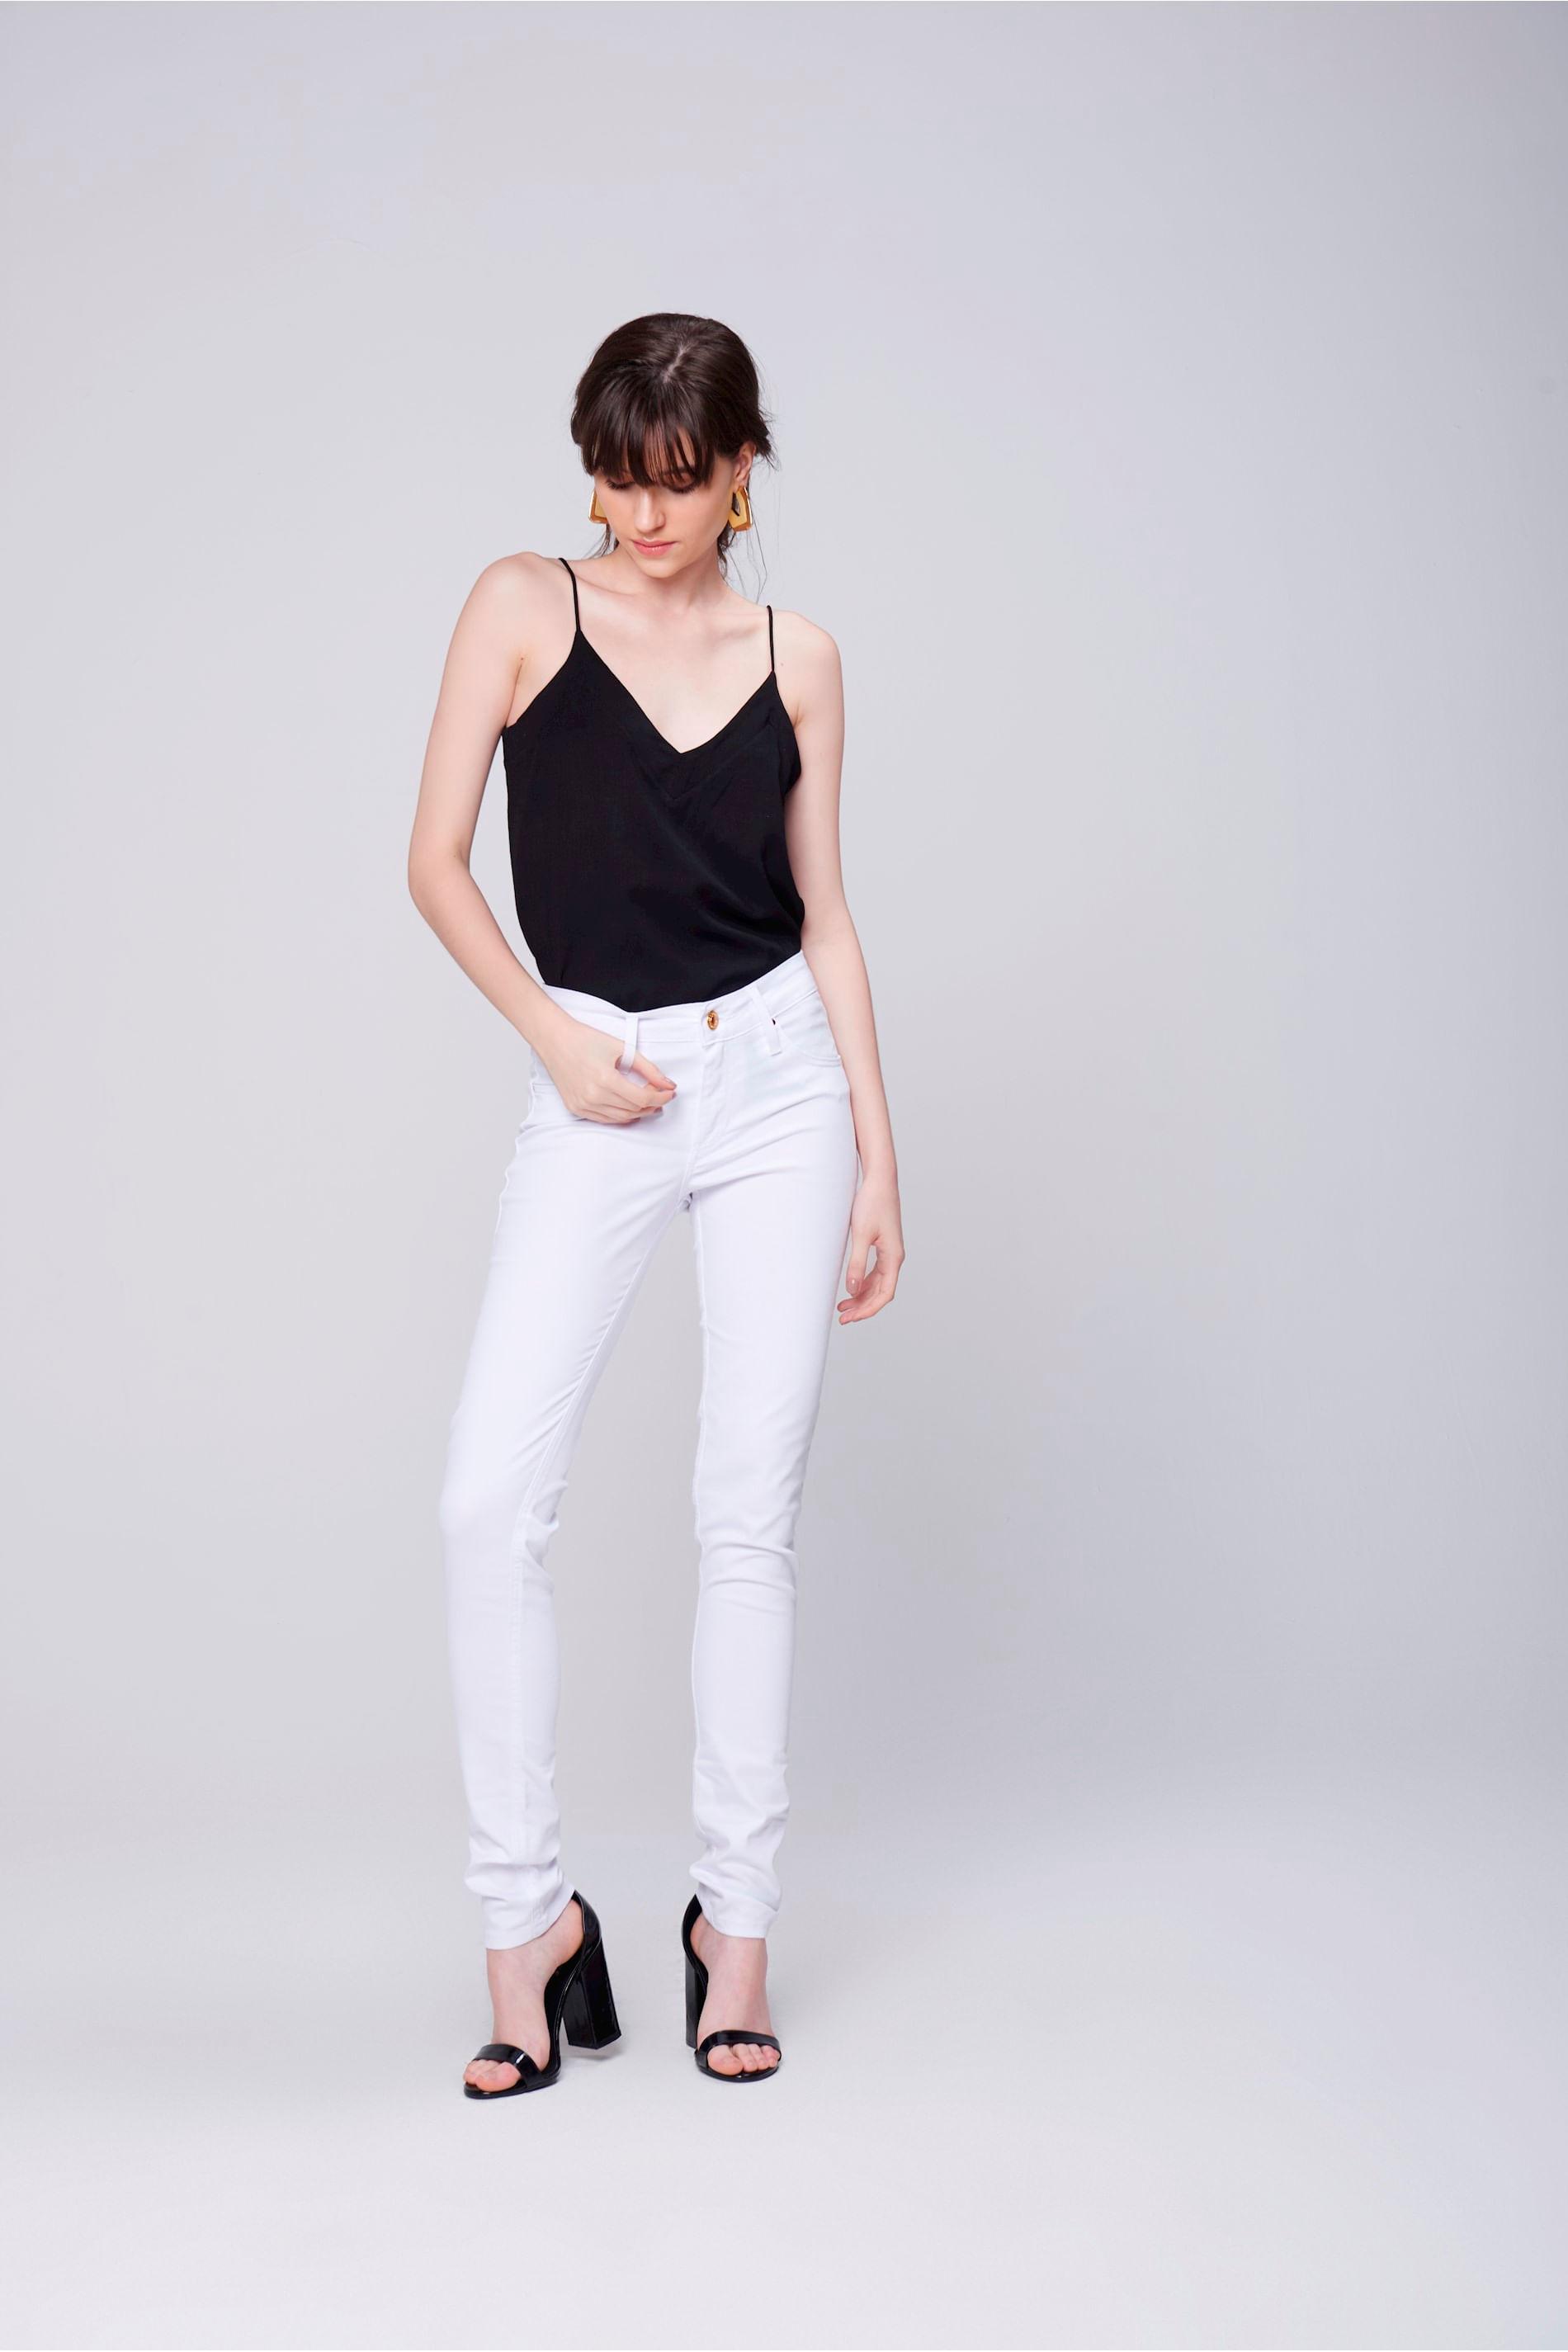 929b61df8 Damyller · Moda Feminina · Calças · Skinny. abrir